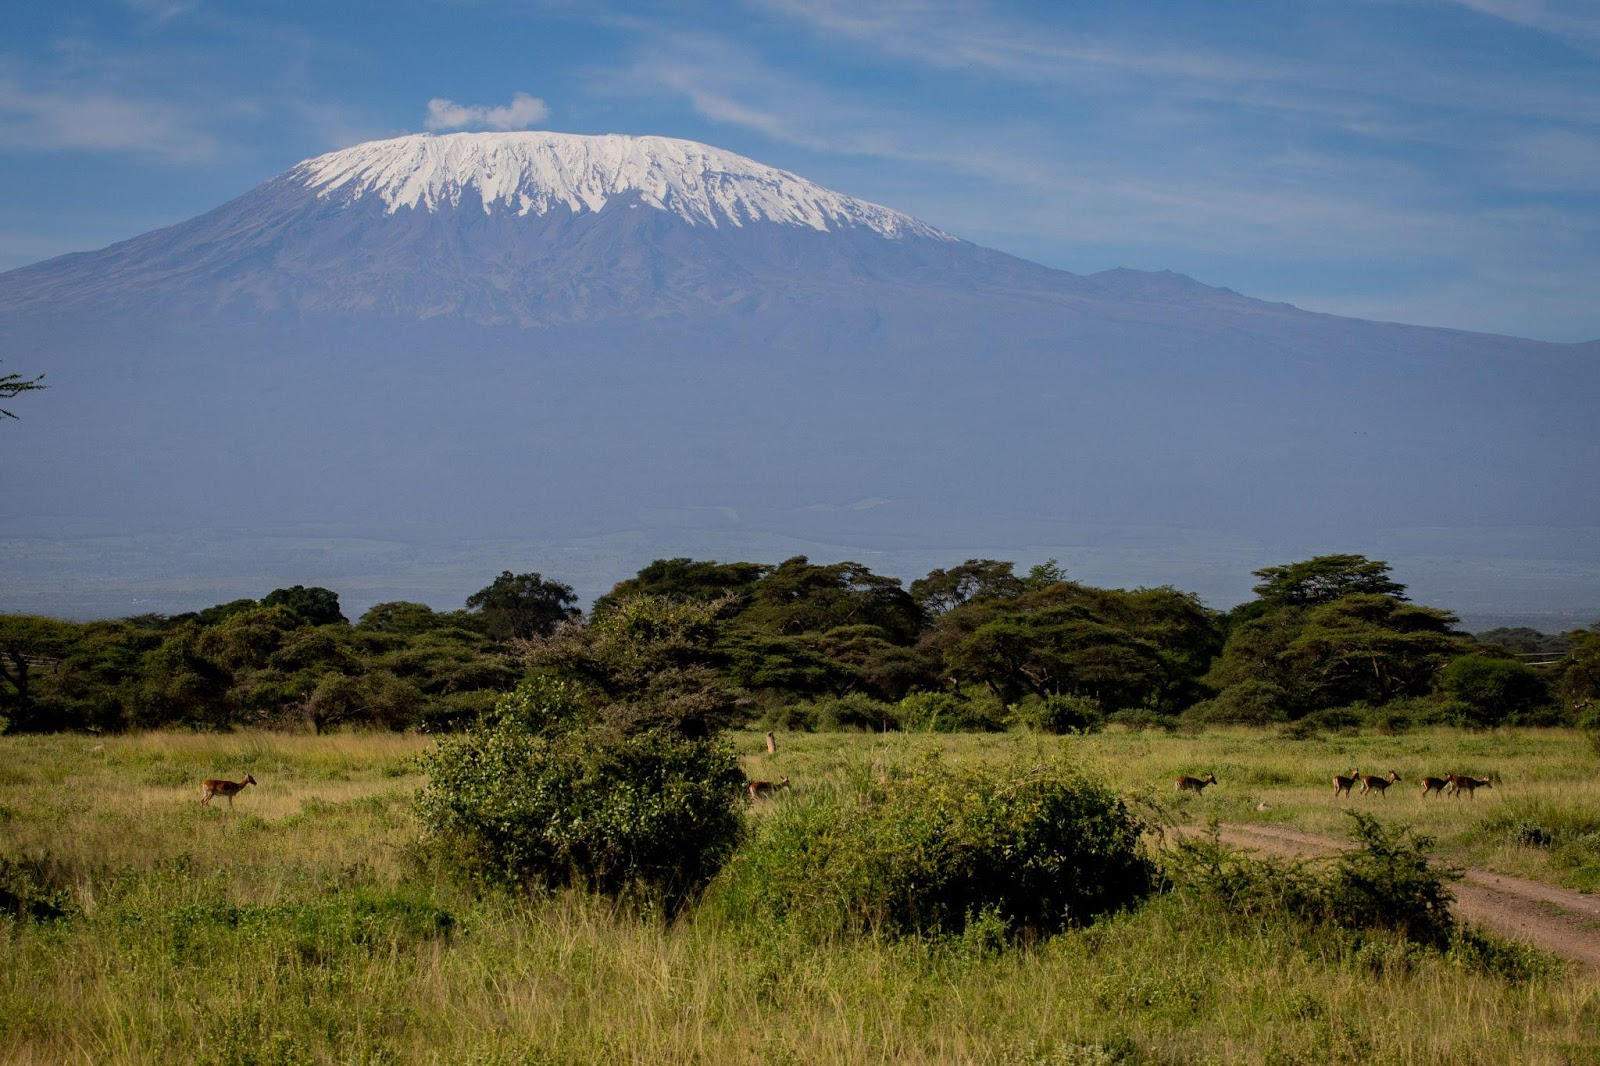 Kilimanjaro Bush Camp - photo by Ryan Frederick Wiramidjaja